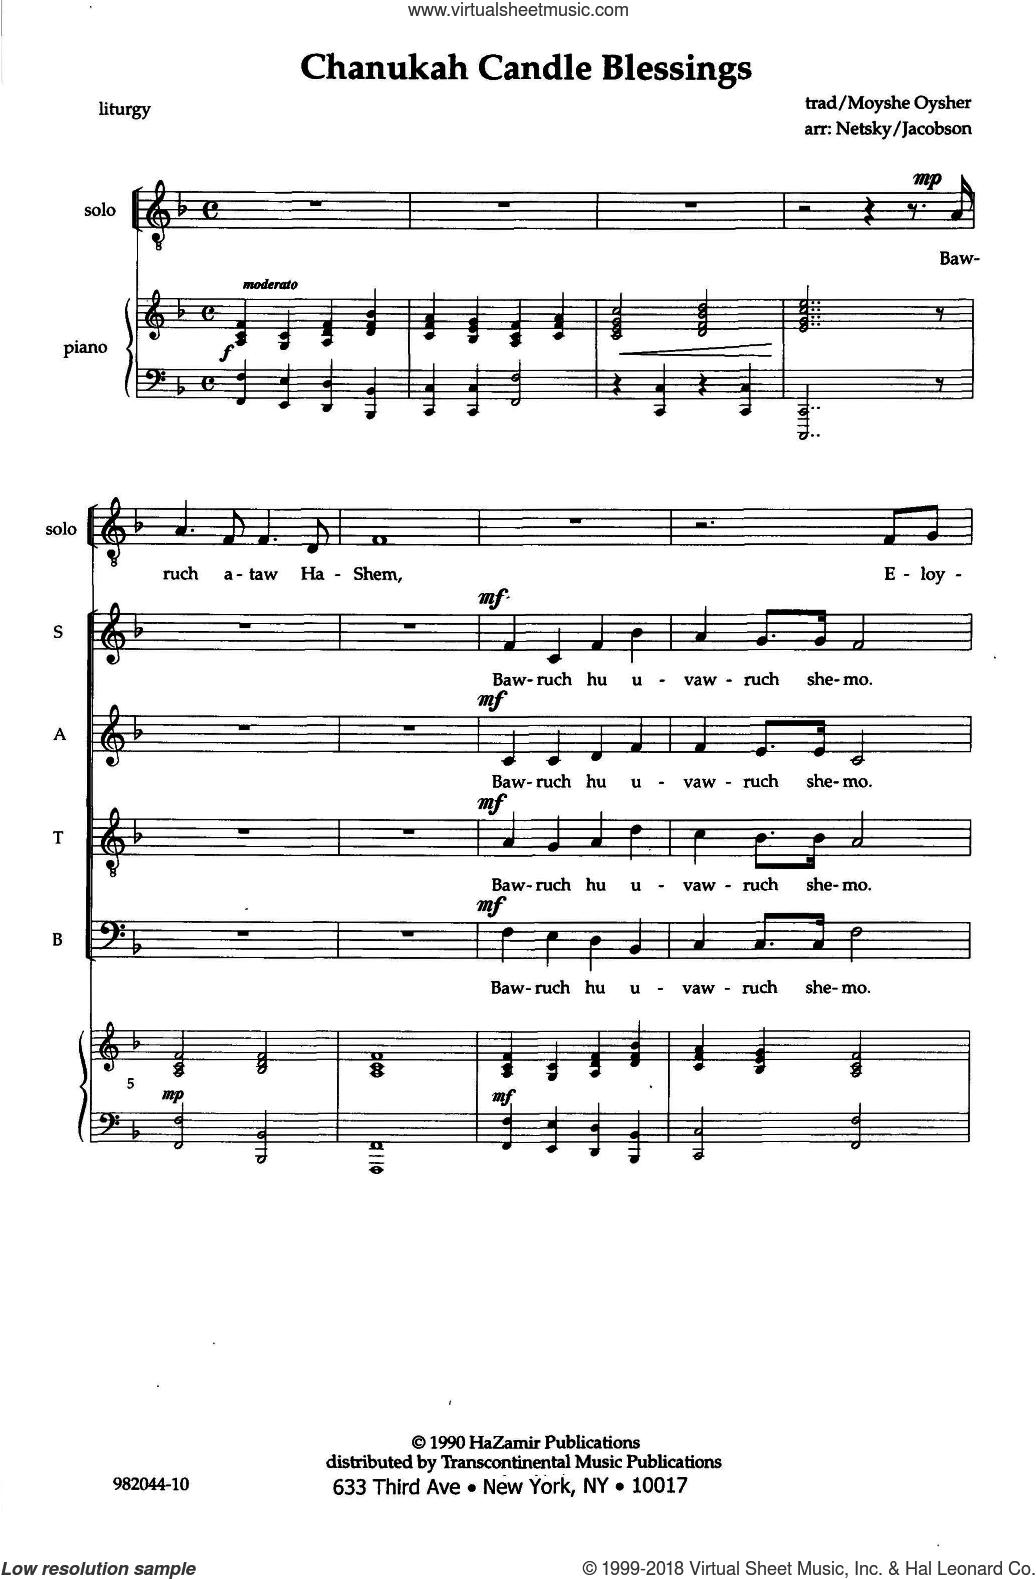 Candle Blessings For Chanukah sheet music for choir (SATB: soprano, alto, tenor, bass) by Joshua Jacobson, intermediate skill level